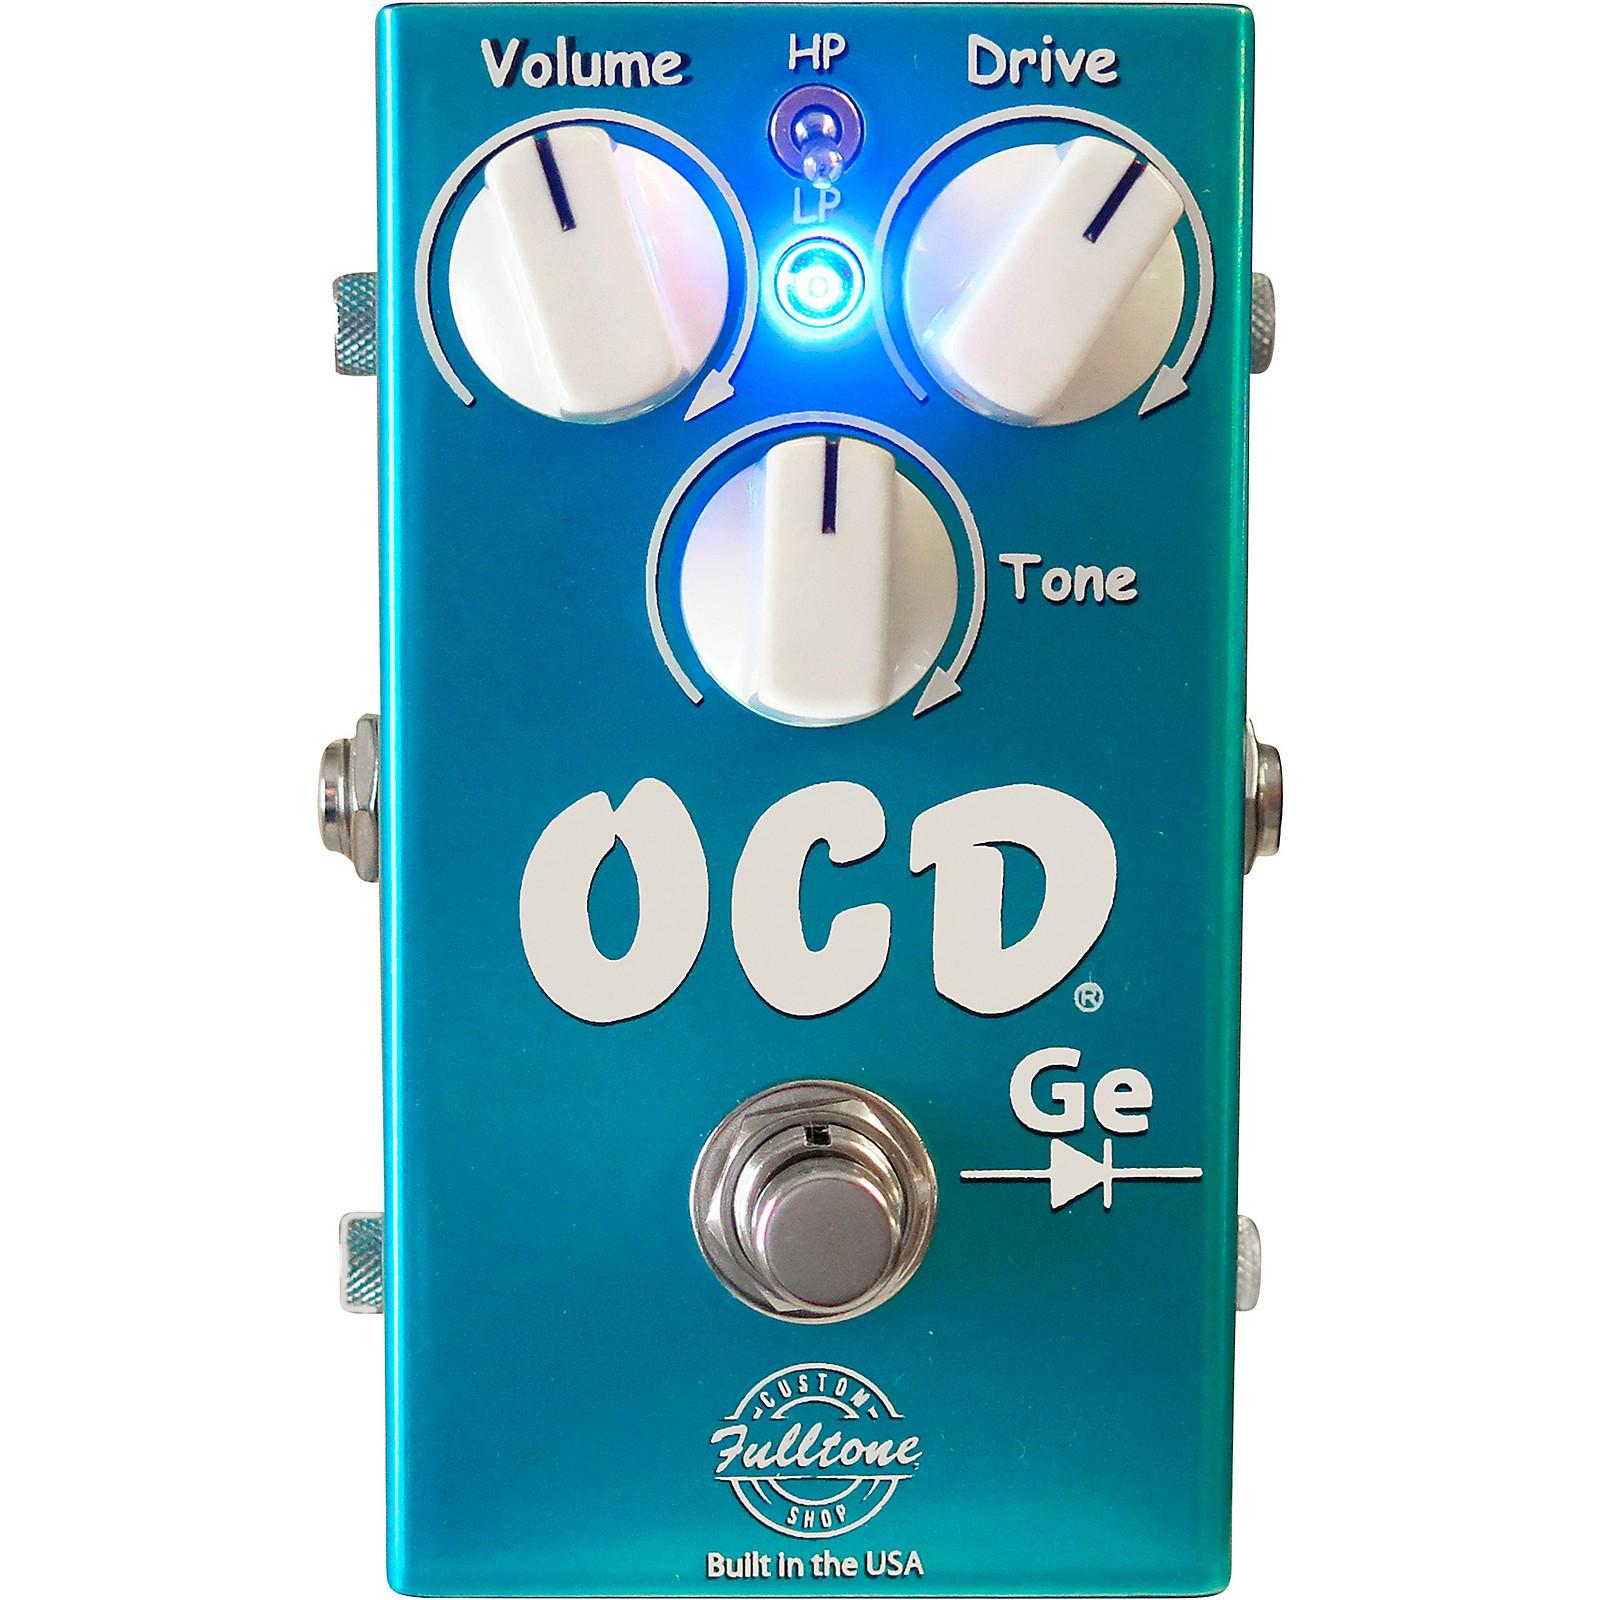 Fulltone Custom Shop OCD-Ge Germanium Overdrive Effects Pedal